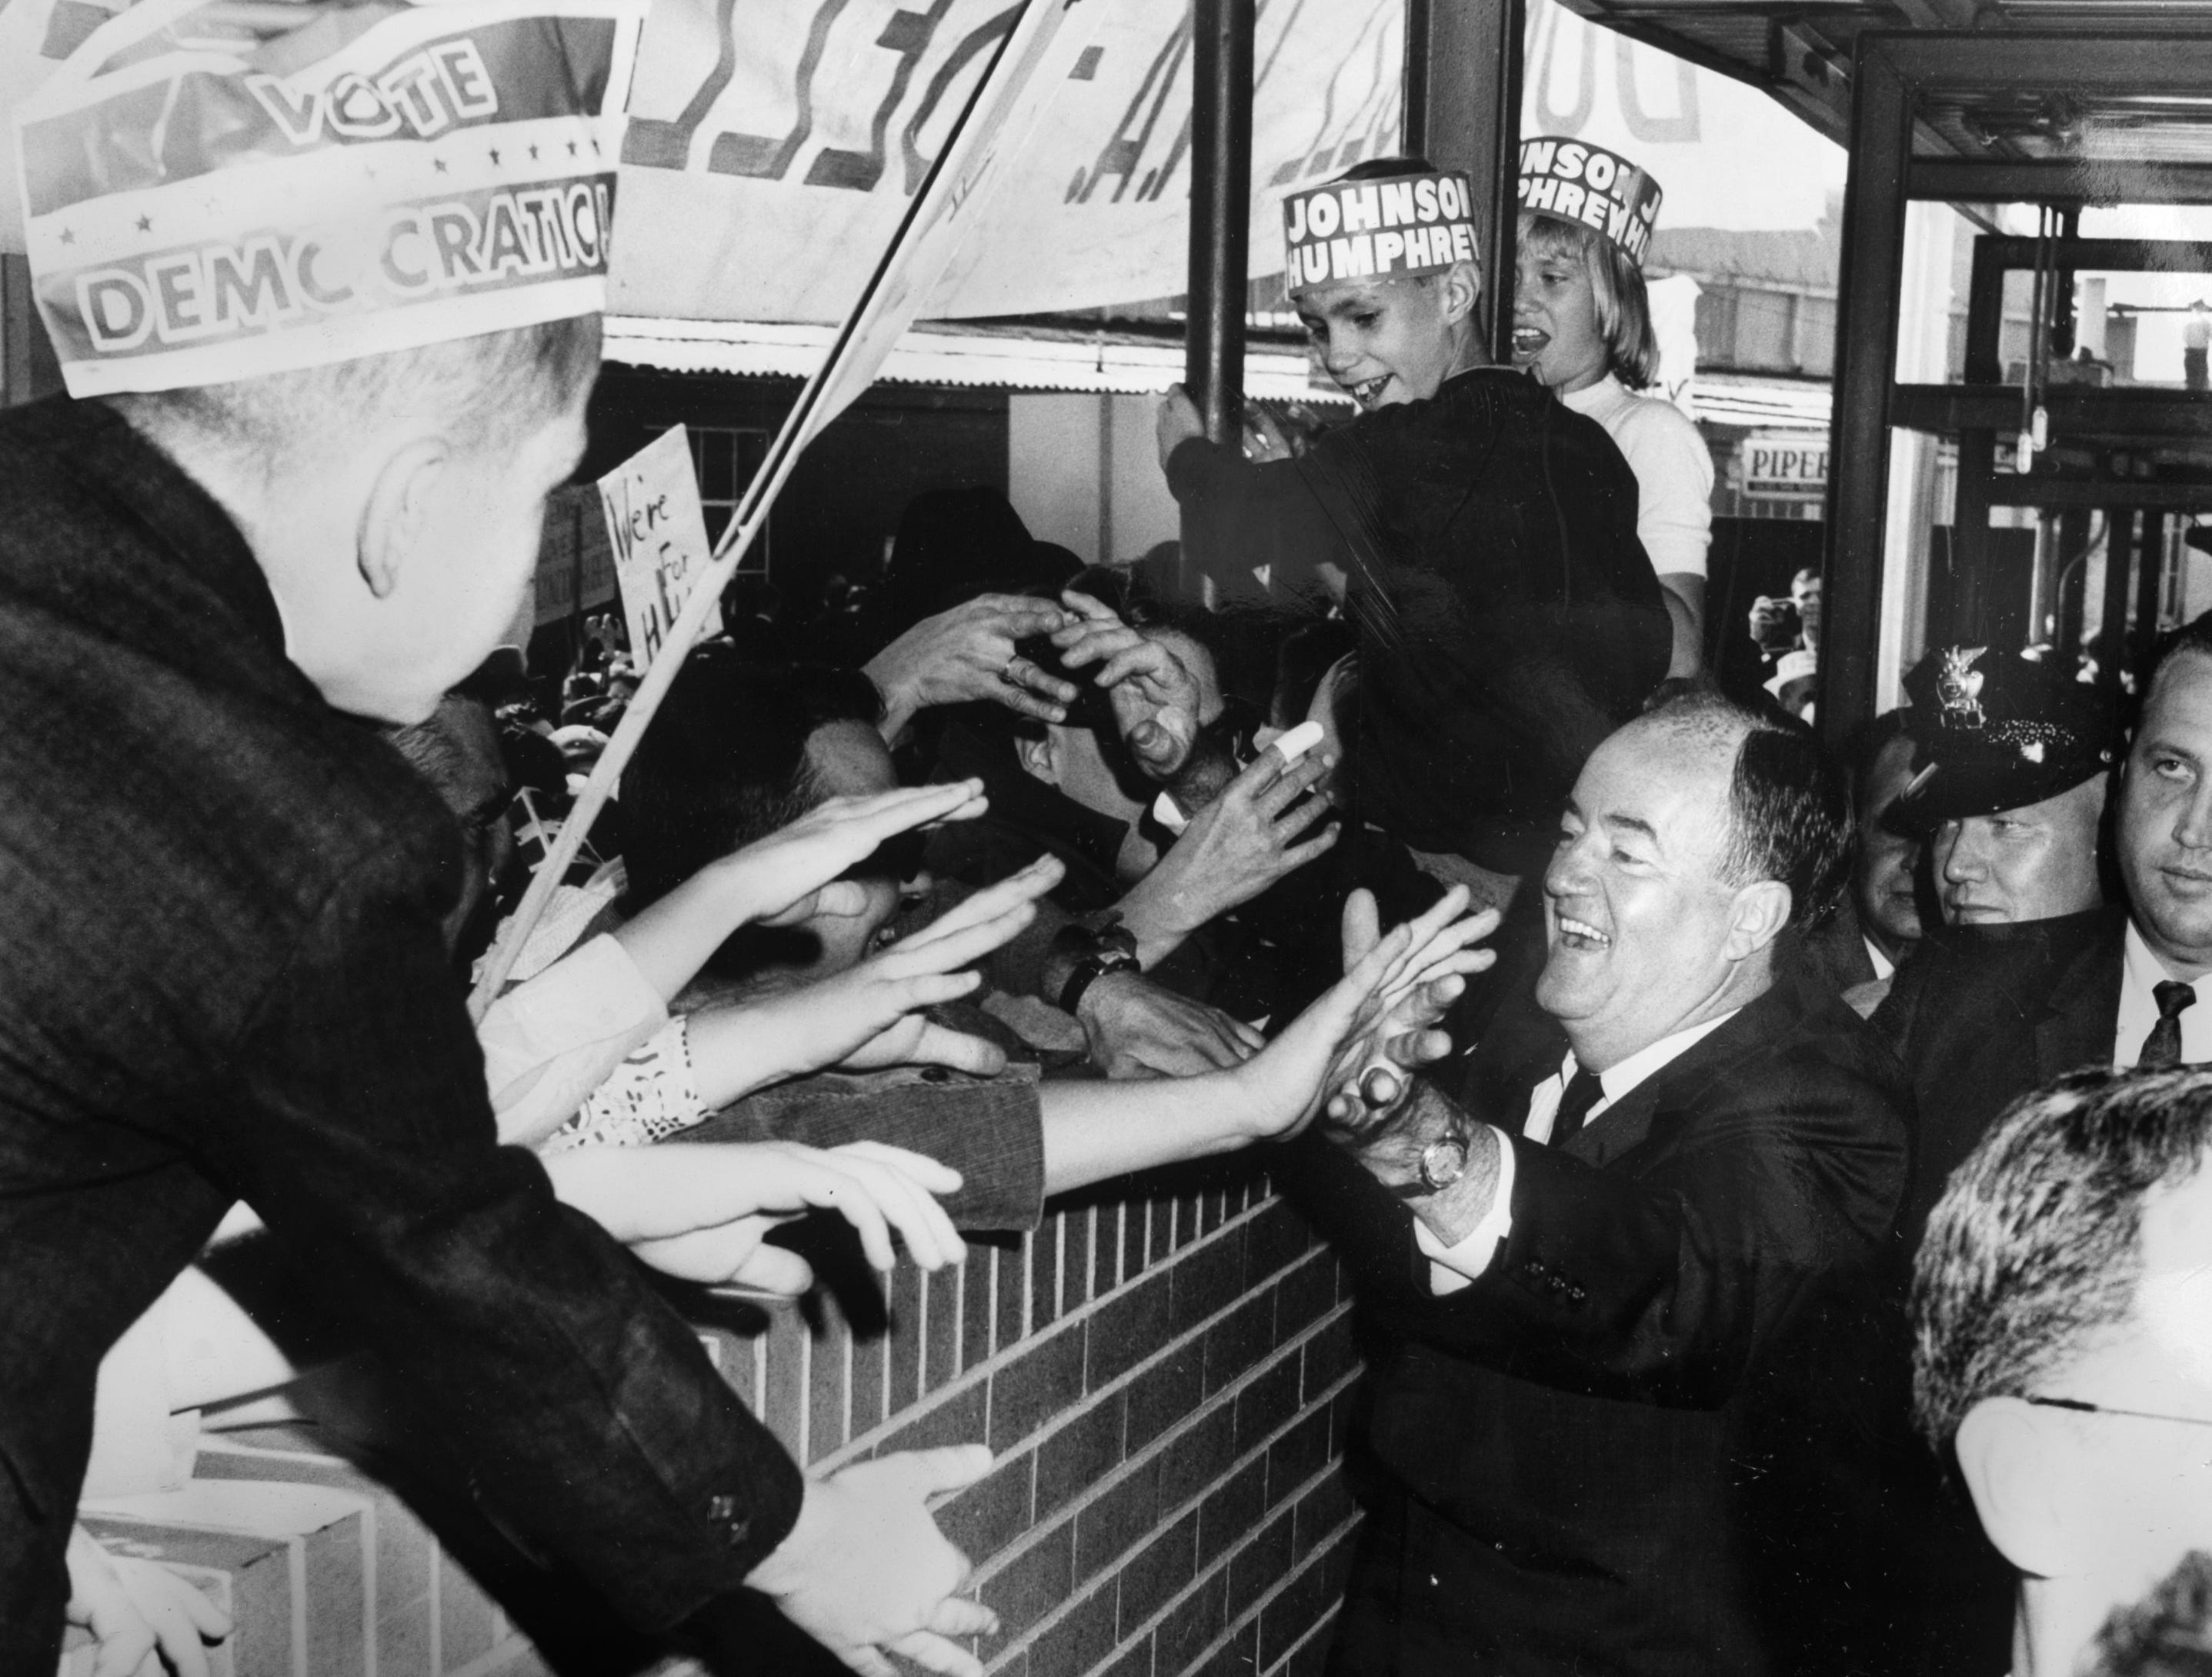 U.S. Sen. Humbert Humphrey campaigns for Vice President on Oct. 17, 1964, at Municipal Airport.